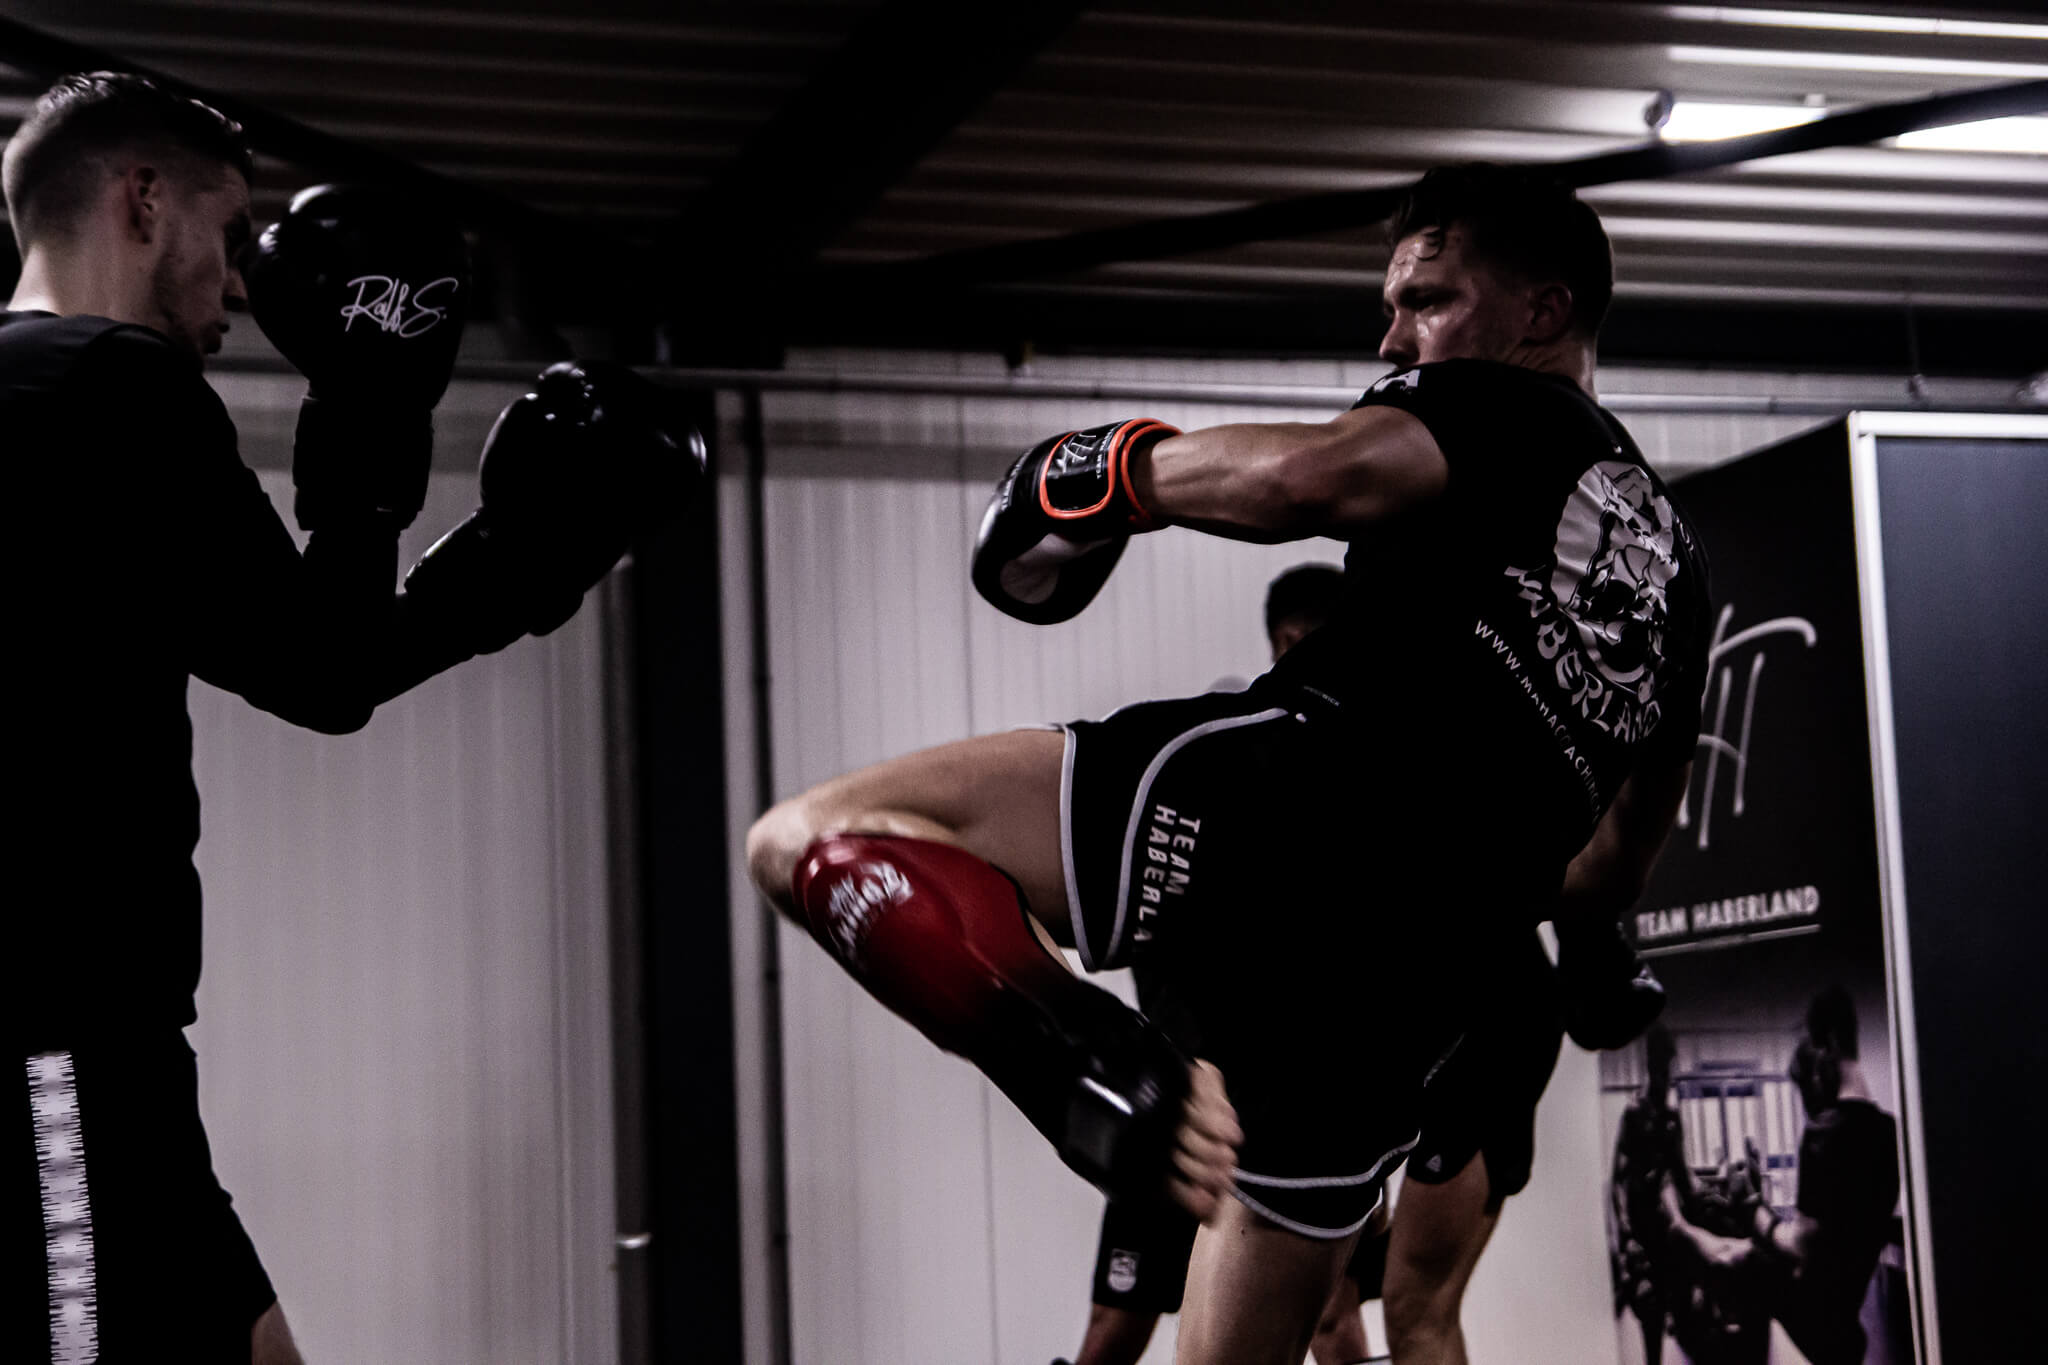 Kickboks training